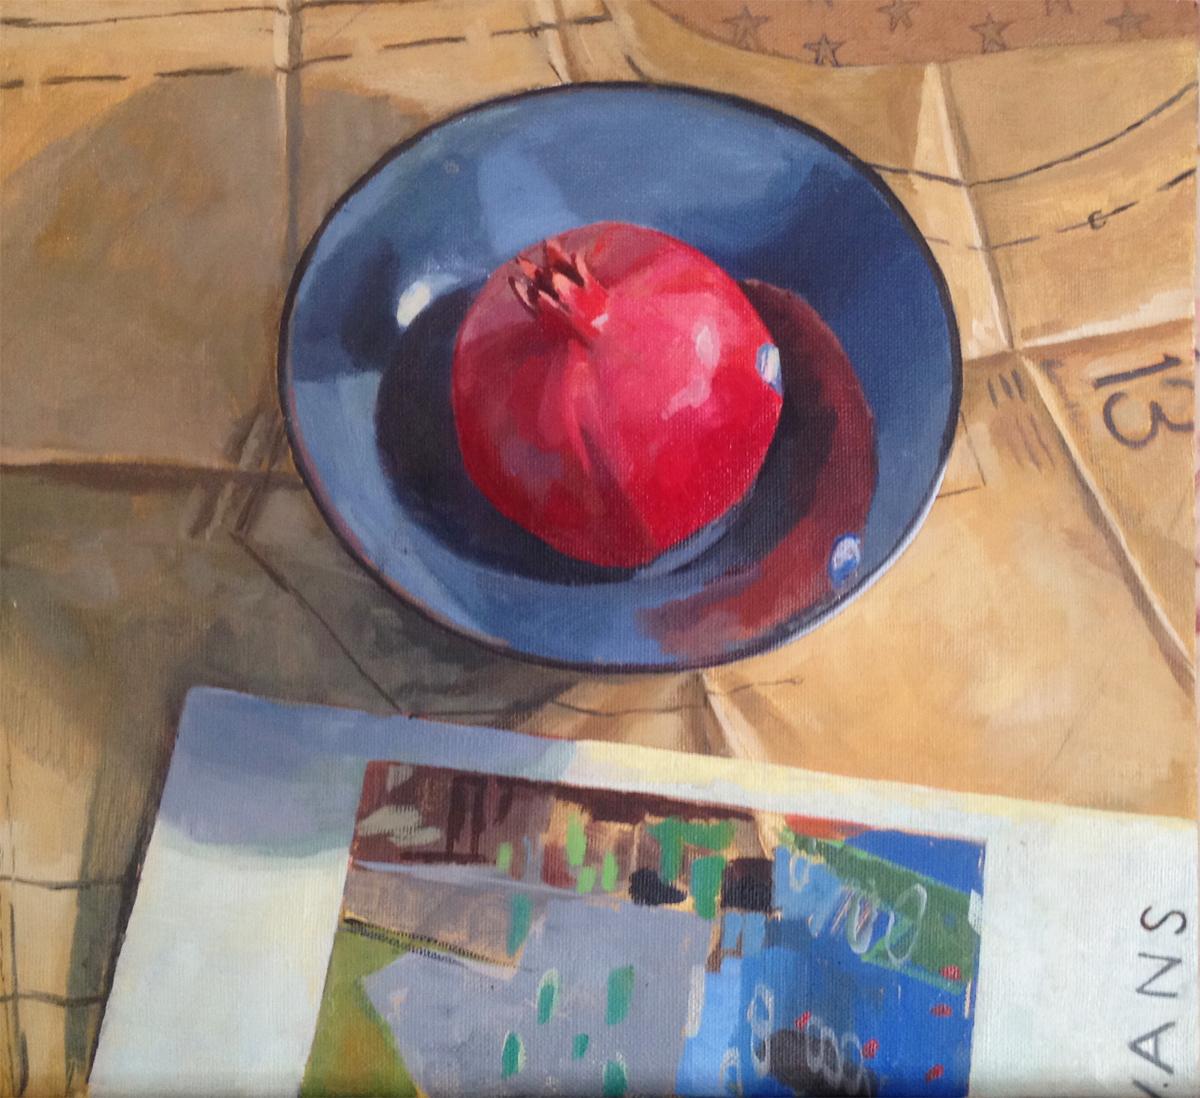 Bulls eye, oil on canvas, 14x12